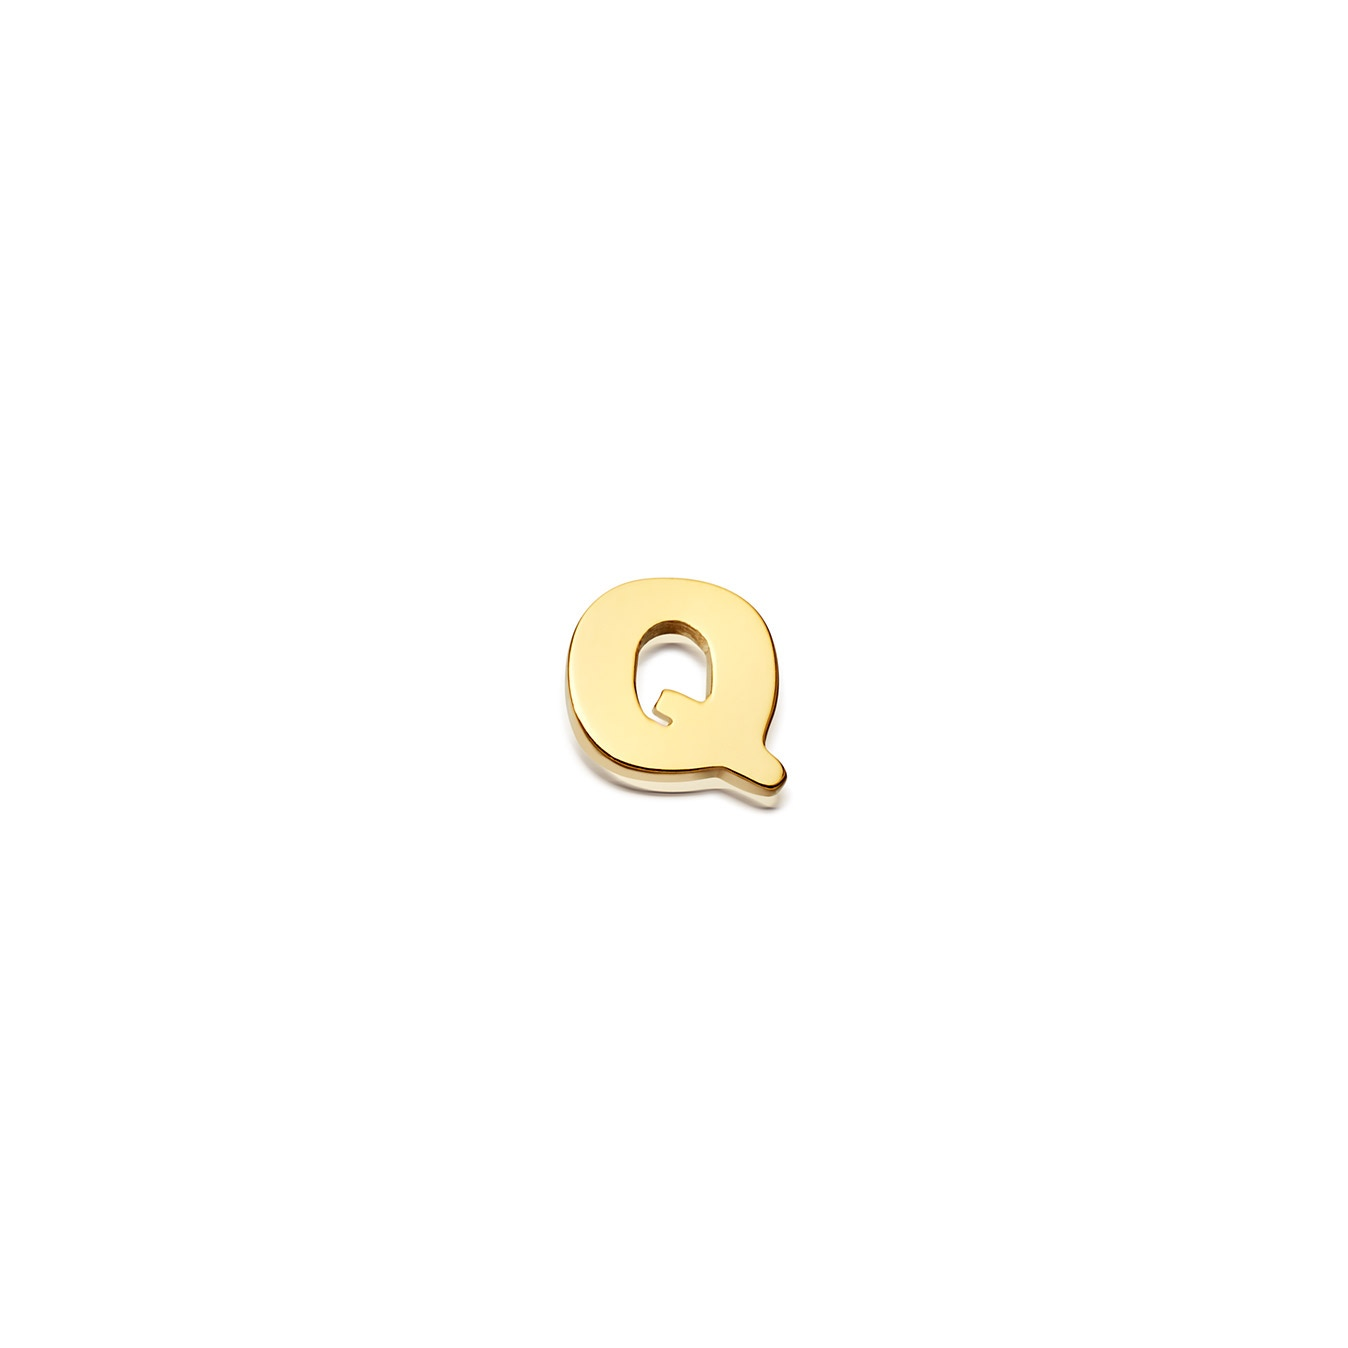 Initial 'Q' Biography Pin